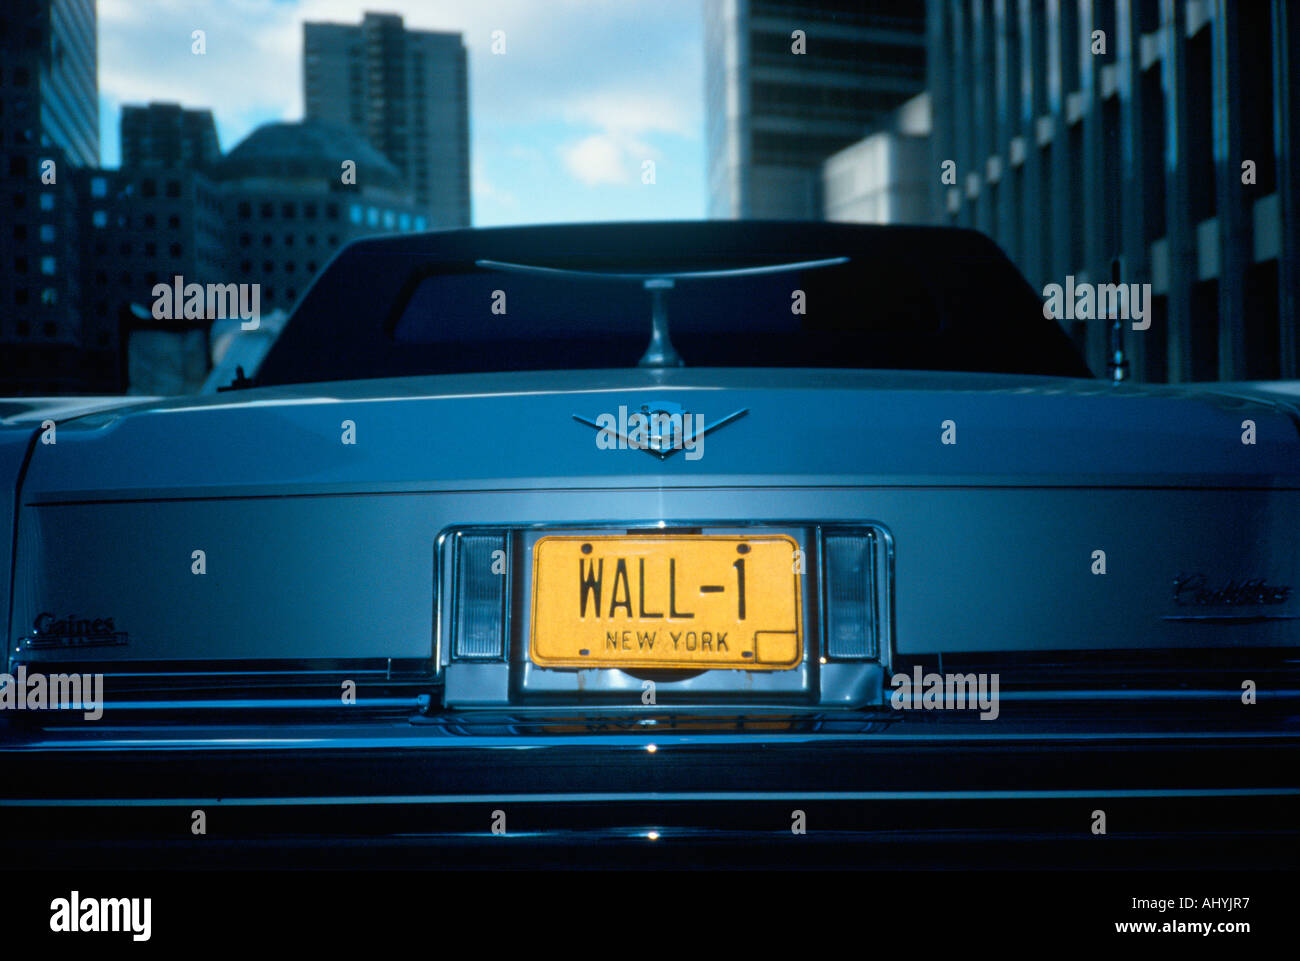 Vanity License Plate New York - Stock Image